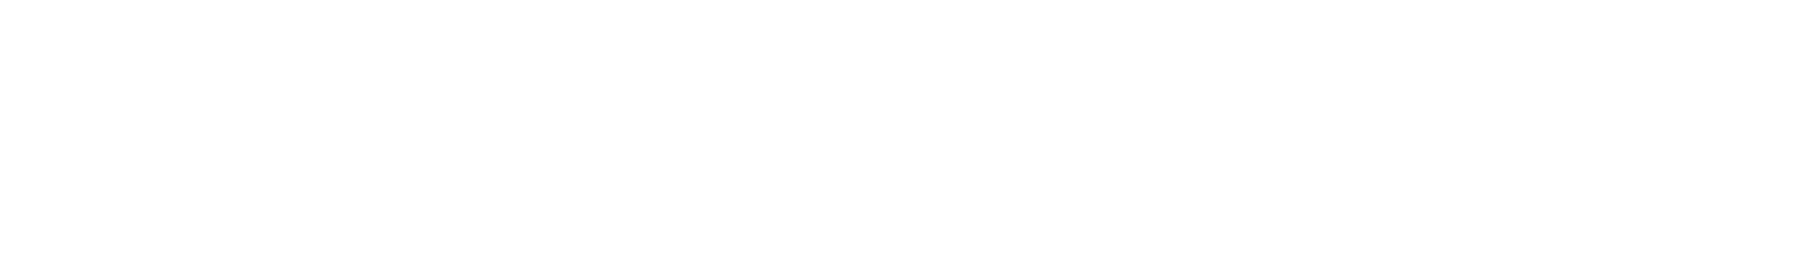 blbc dustygretsch 110 a